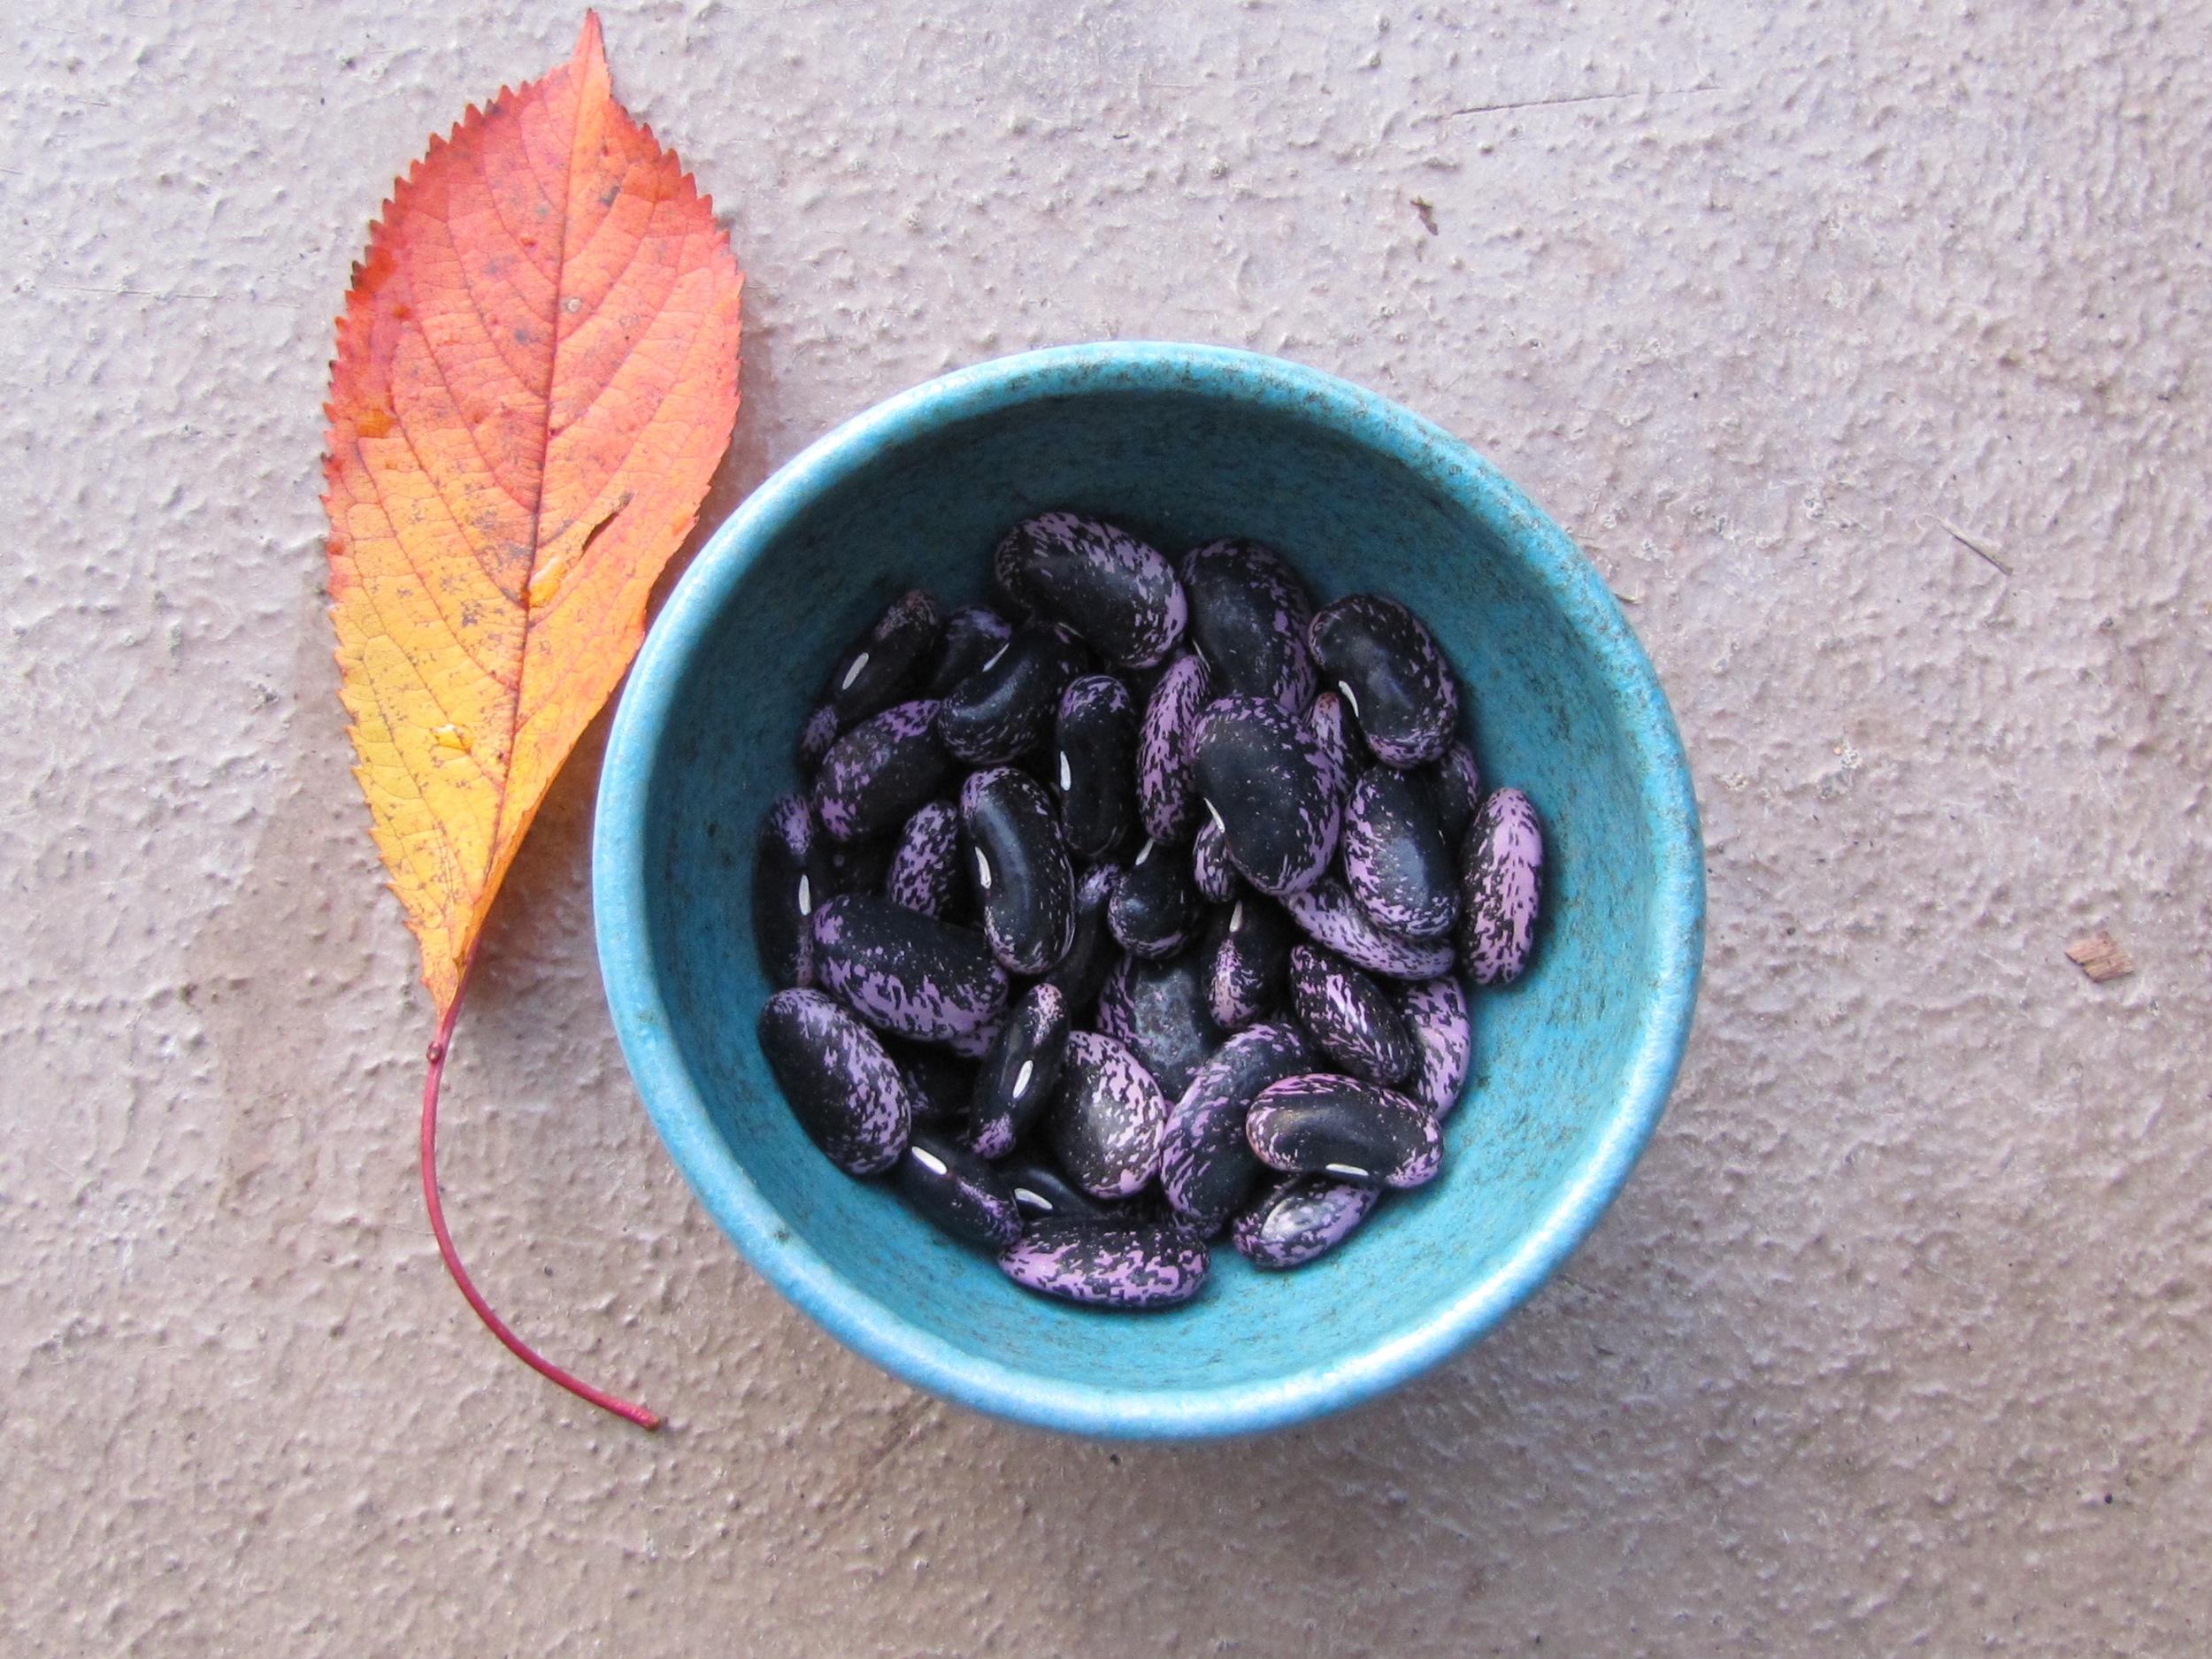 Magical Scarlet Emperor beans